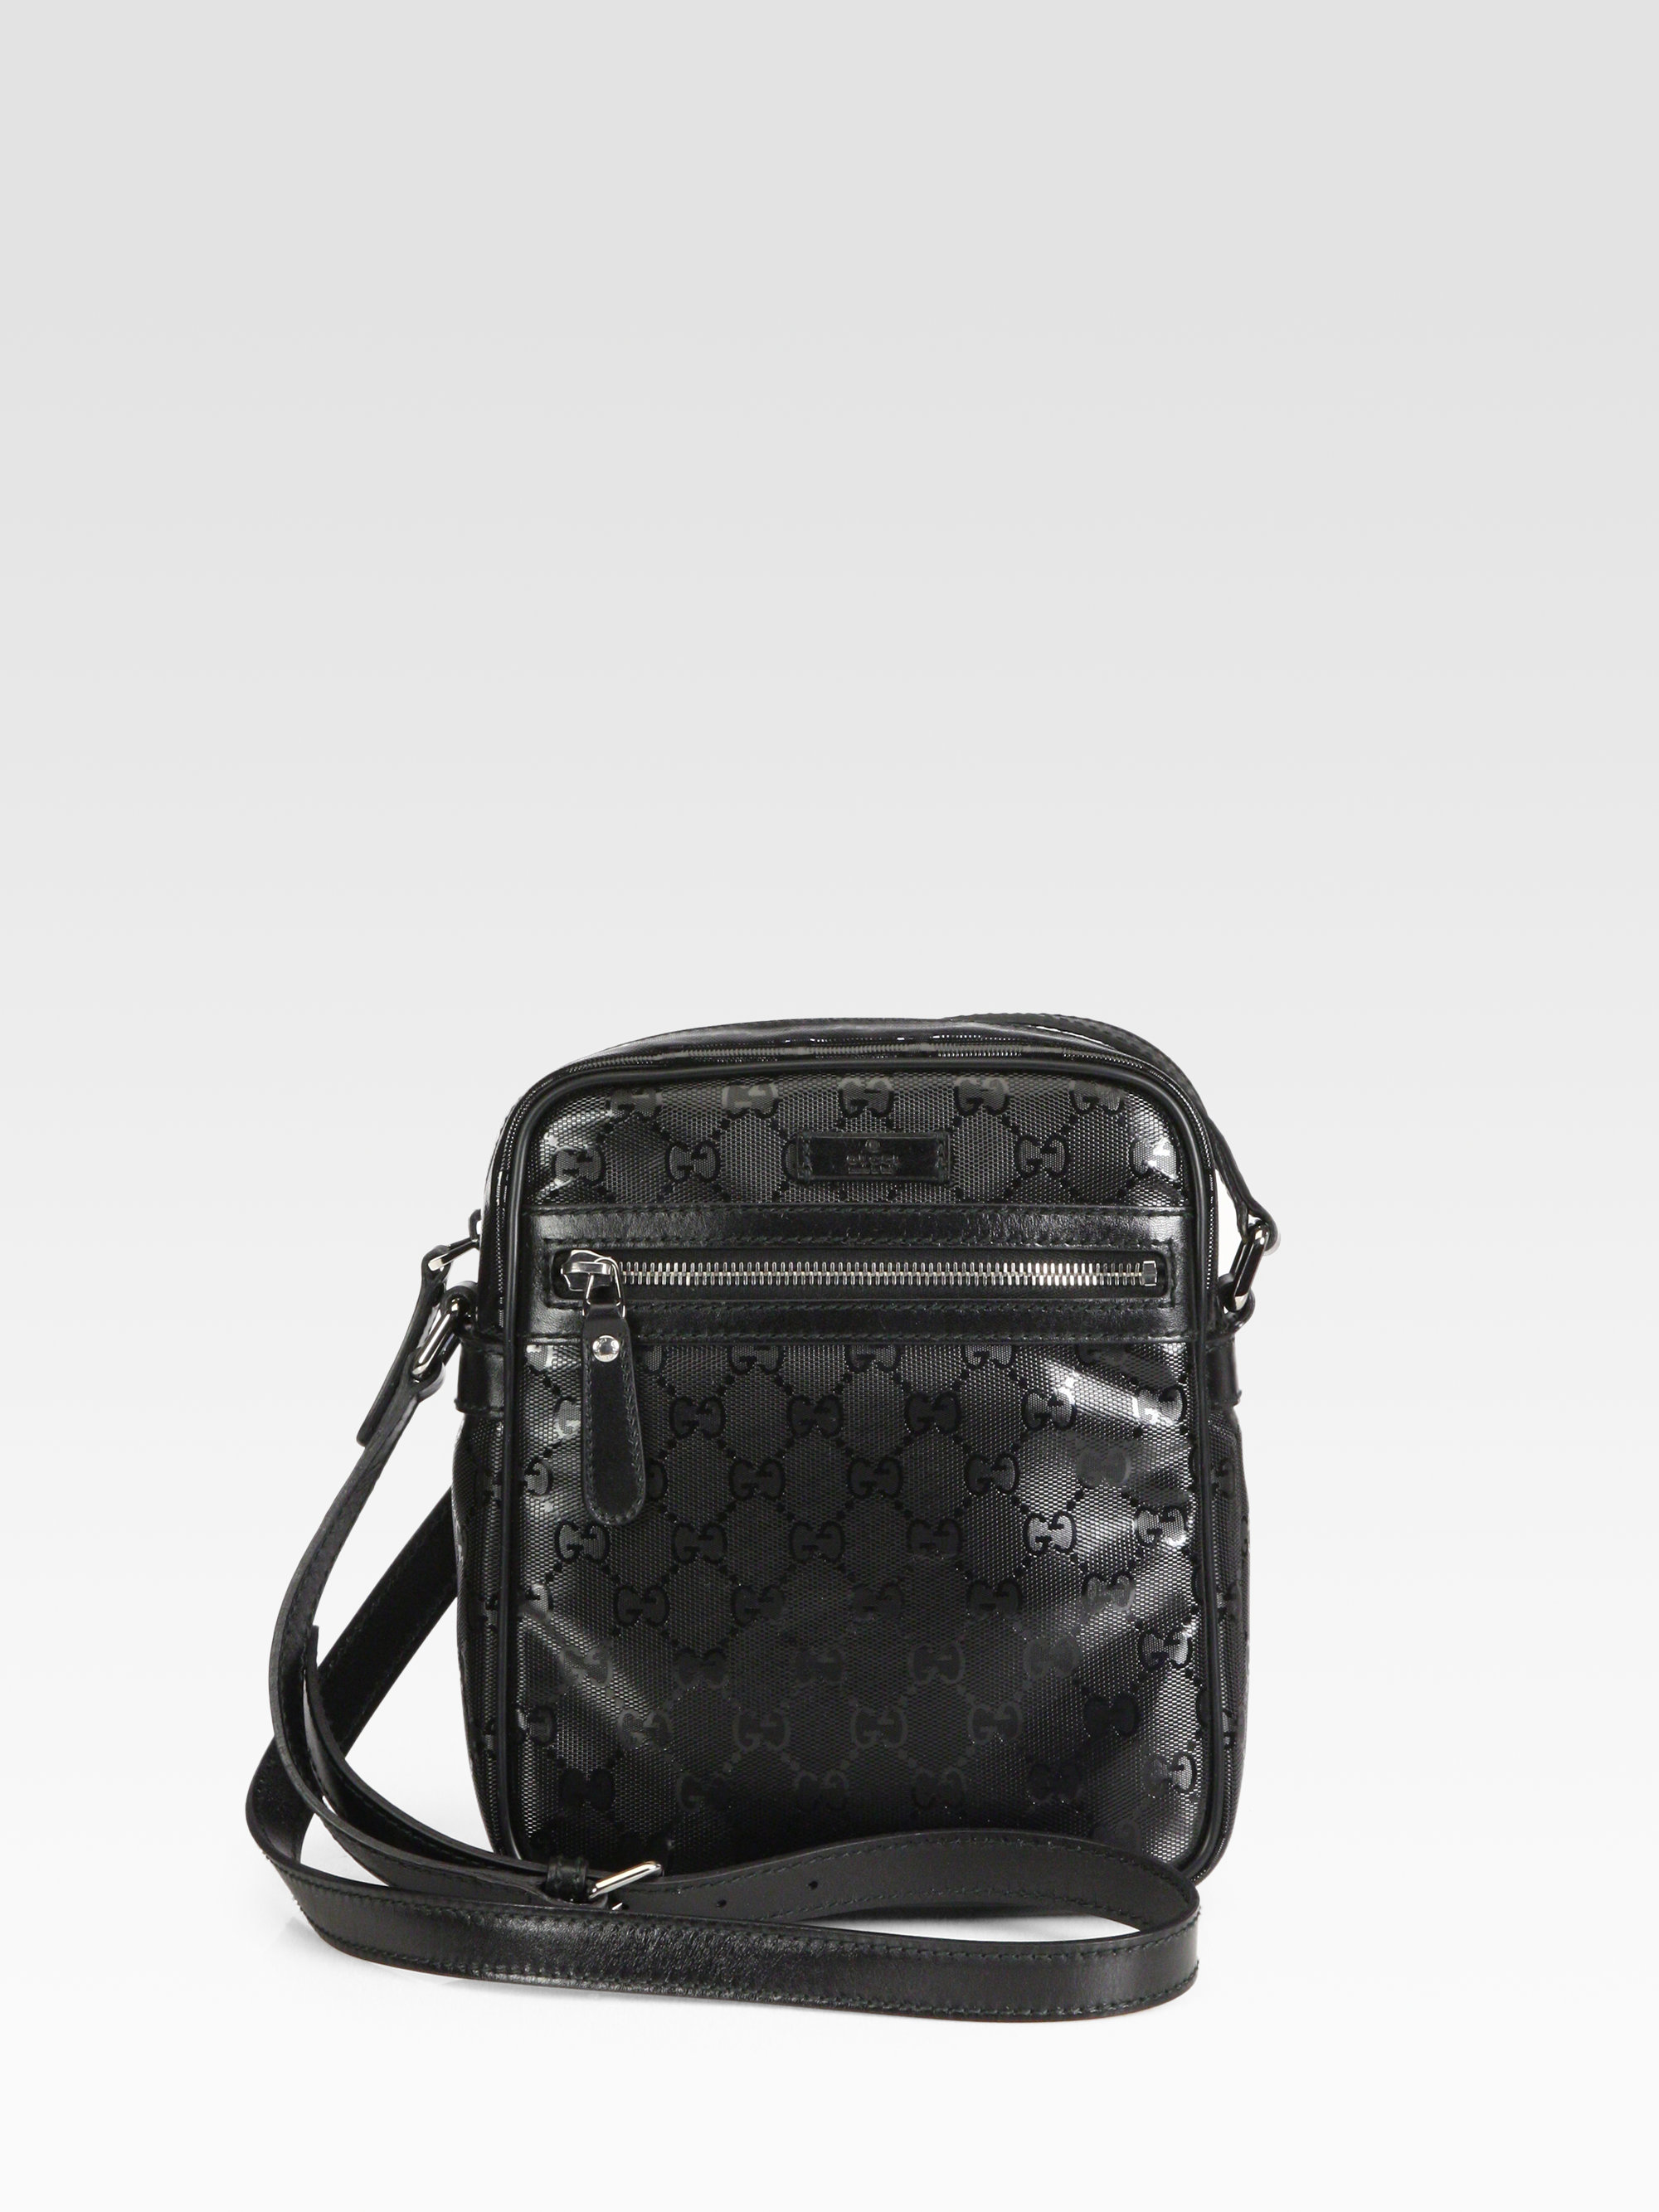 41f7633c0c62 Lyst - Gucci Flight Bag in Black for Men